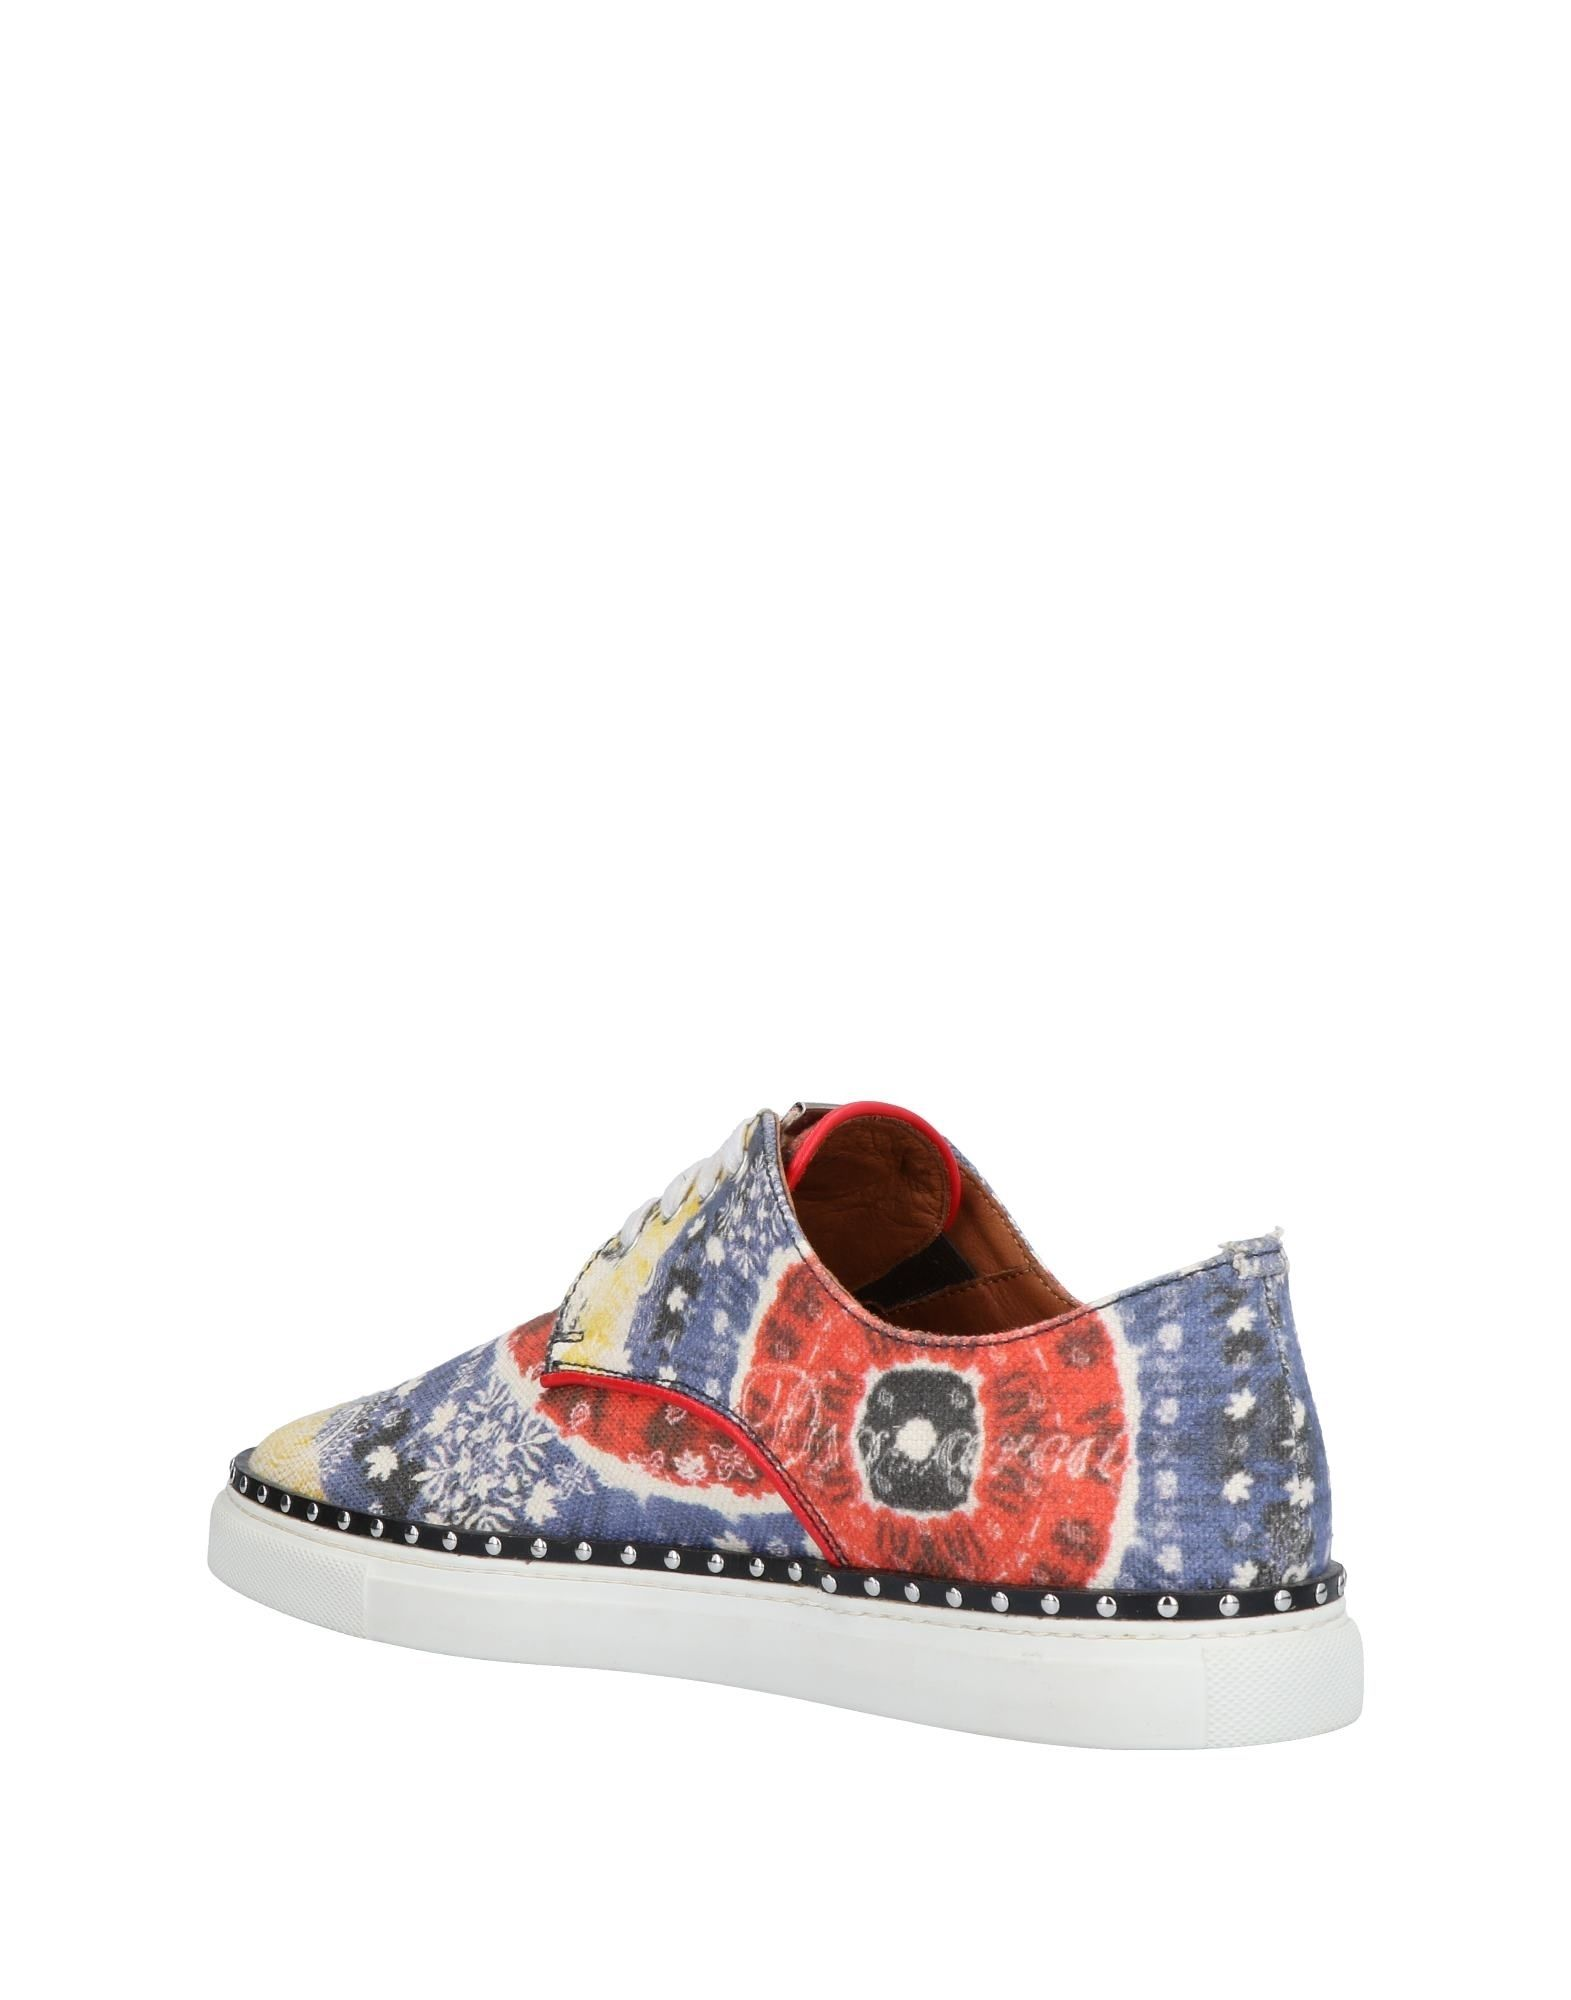 Dsquared2 Sneakers Qualität Herren  11470039OH Gute Qualität Sneakers beliebte Schuhe 621ebf